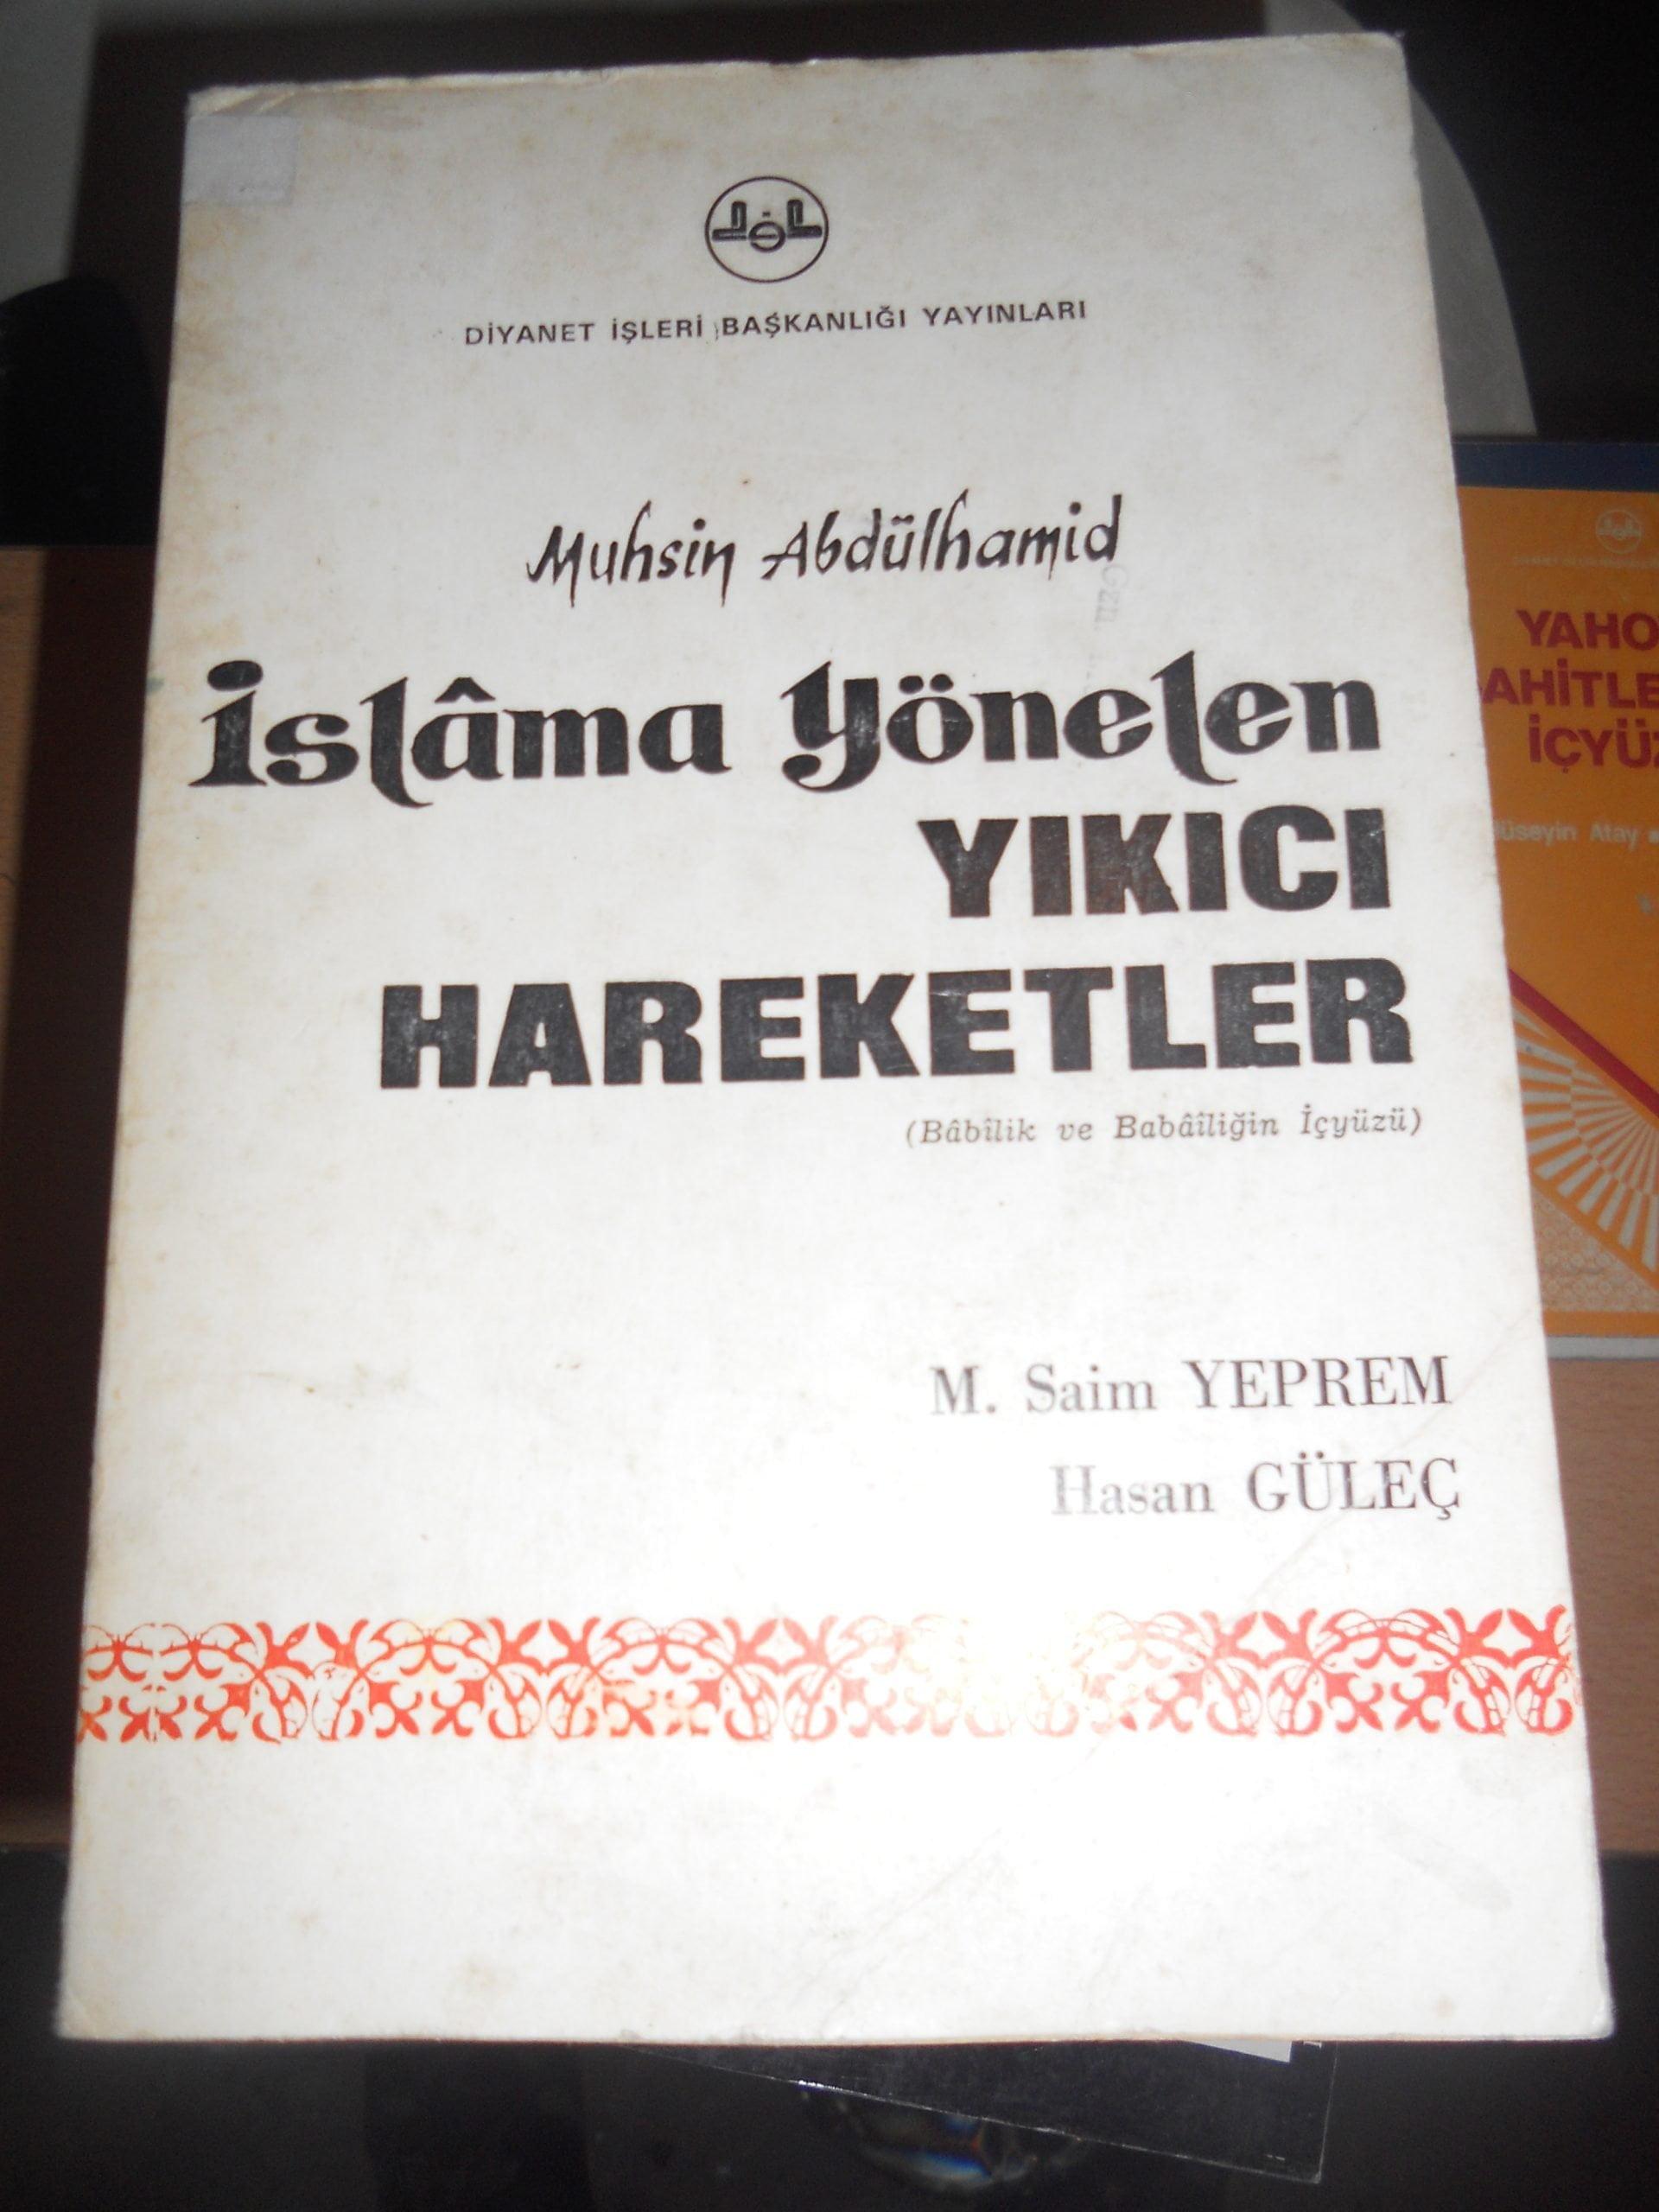 İslama yönelen YIKICI HAREKETLER/Muhsin Abdulhamid/15 tl